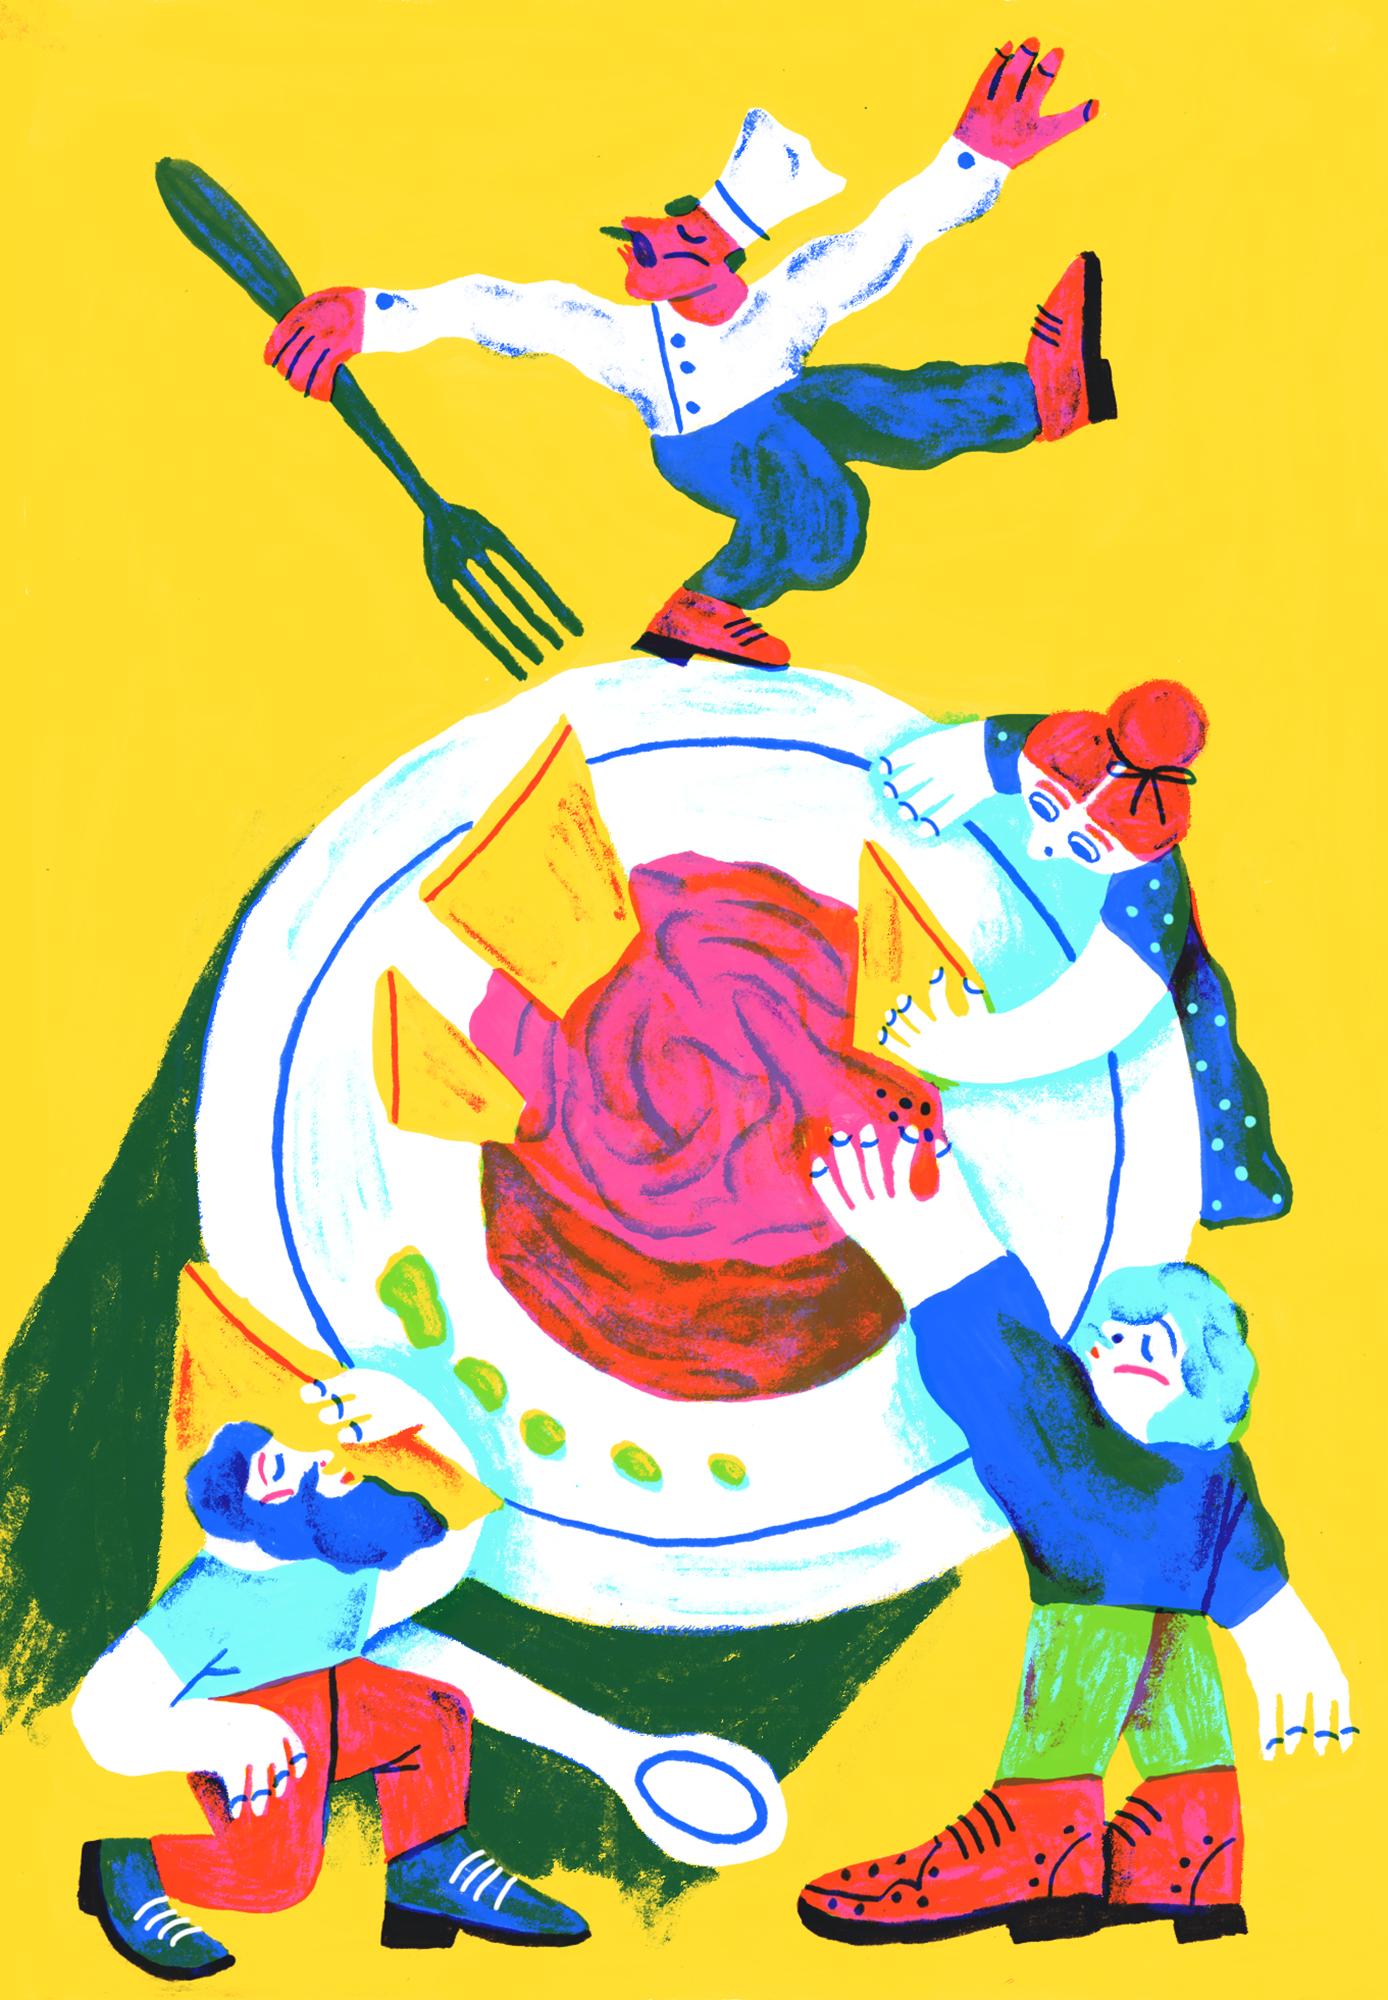 Alice Piaggio - French Lessons, Celebrated Living Magazine